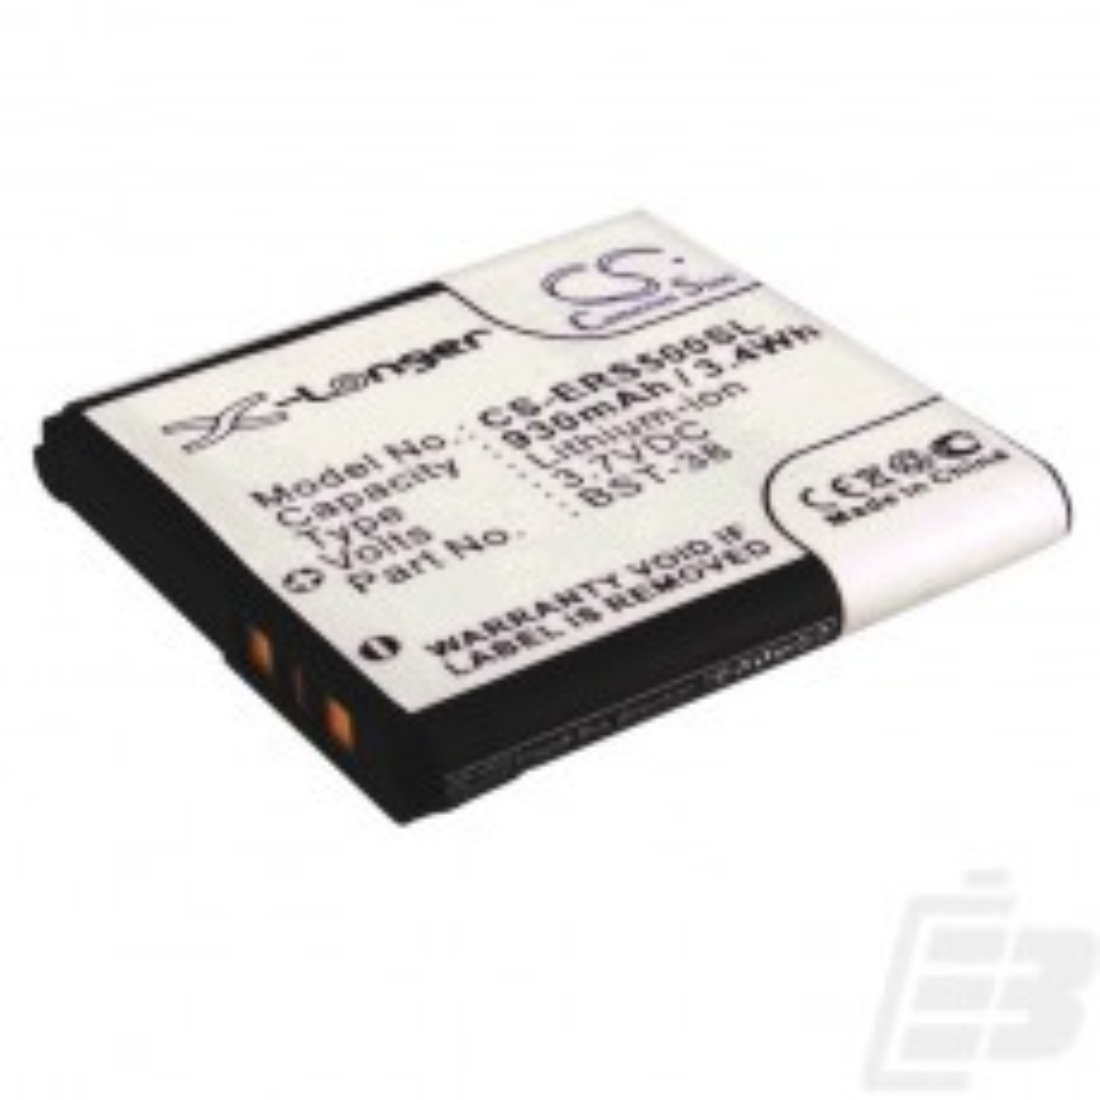 Mobile phone battery Sony Ericsson W995_1